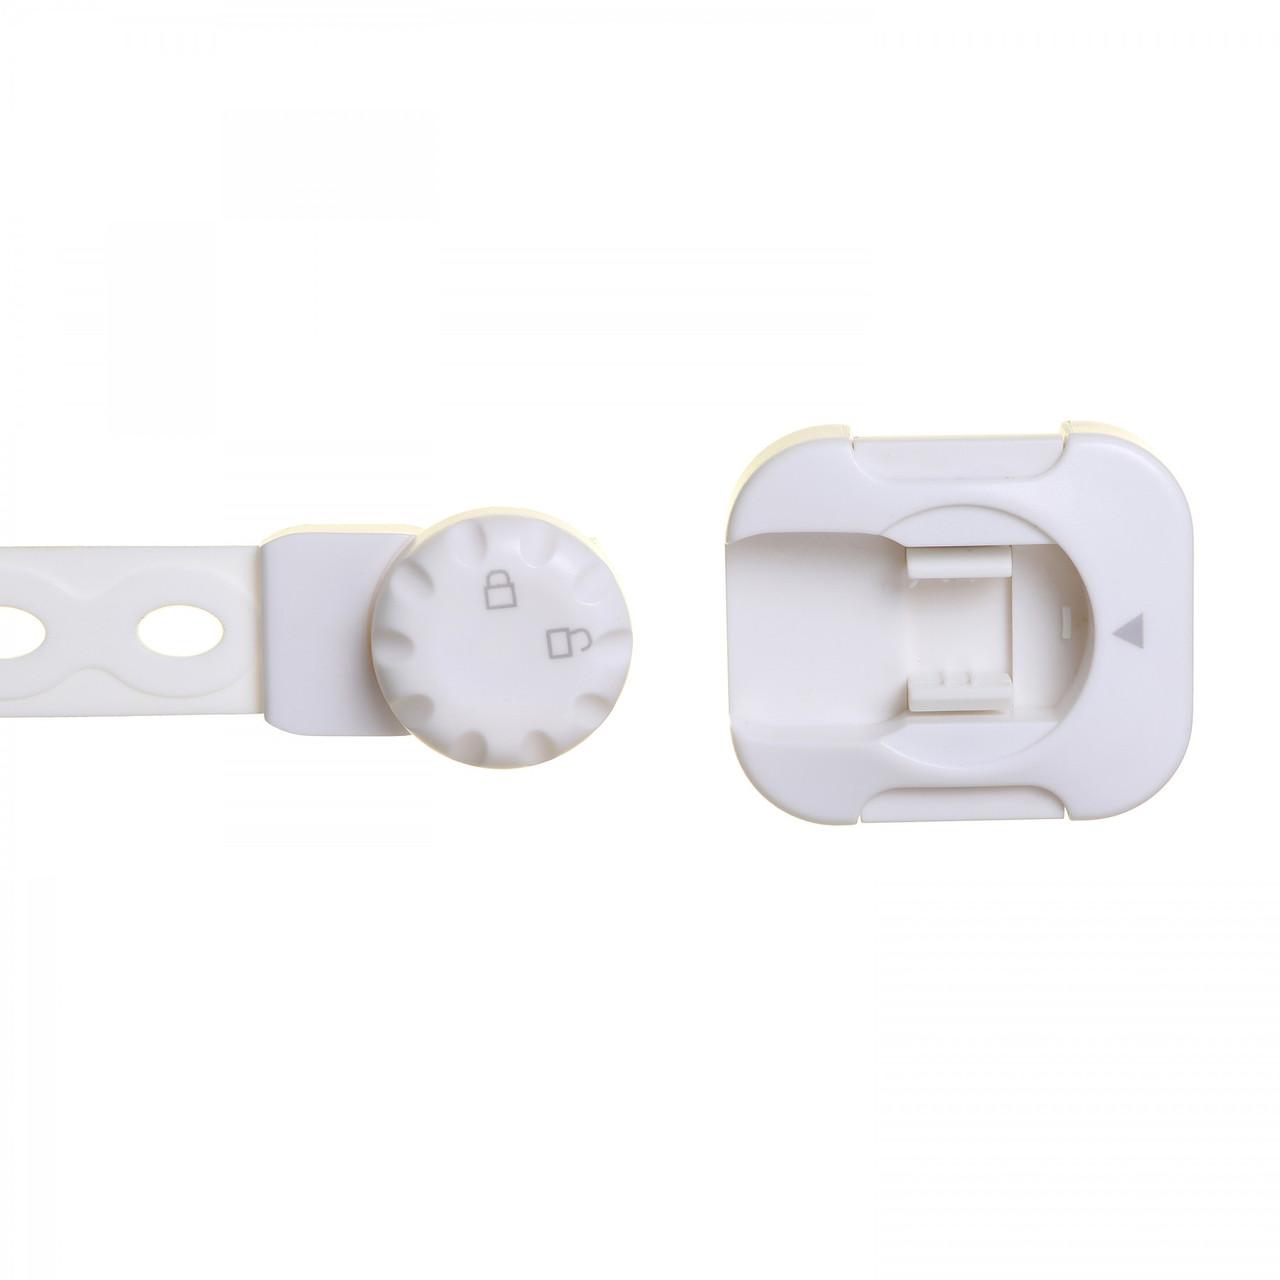 Dreambaby Twist 'N Lock Multi-Purpose Latch 2pk White